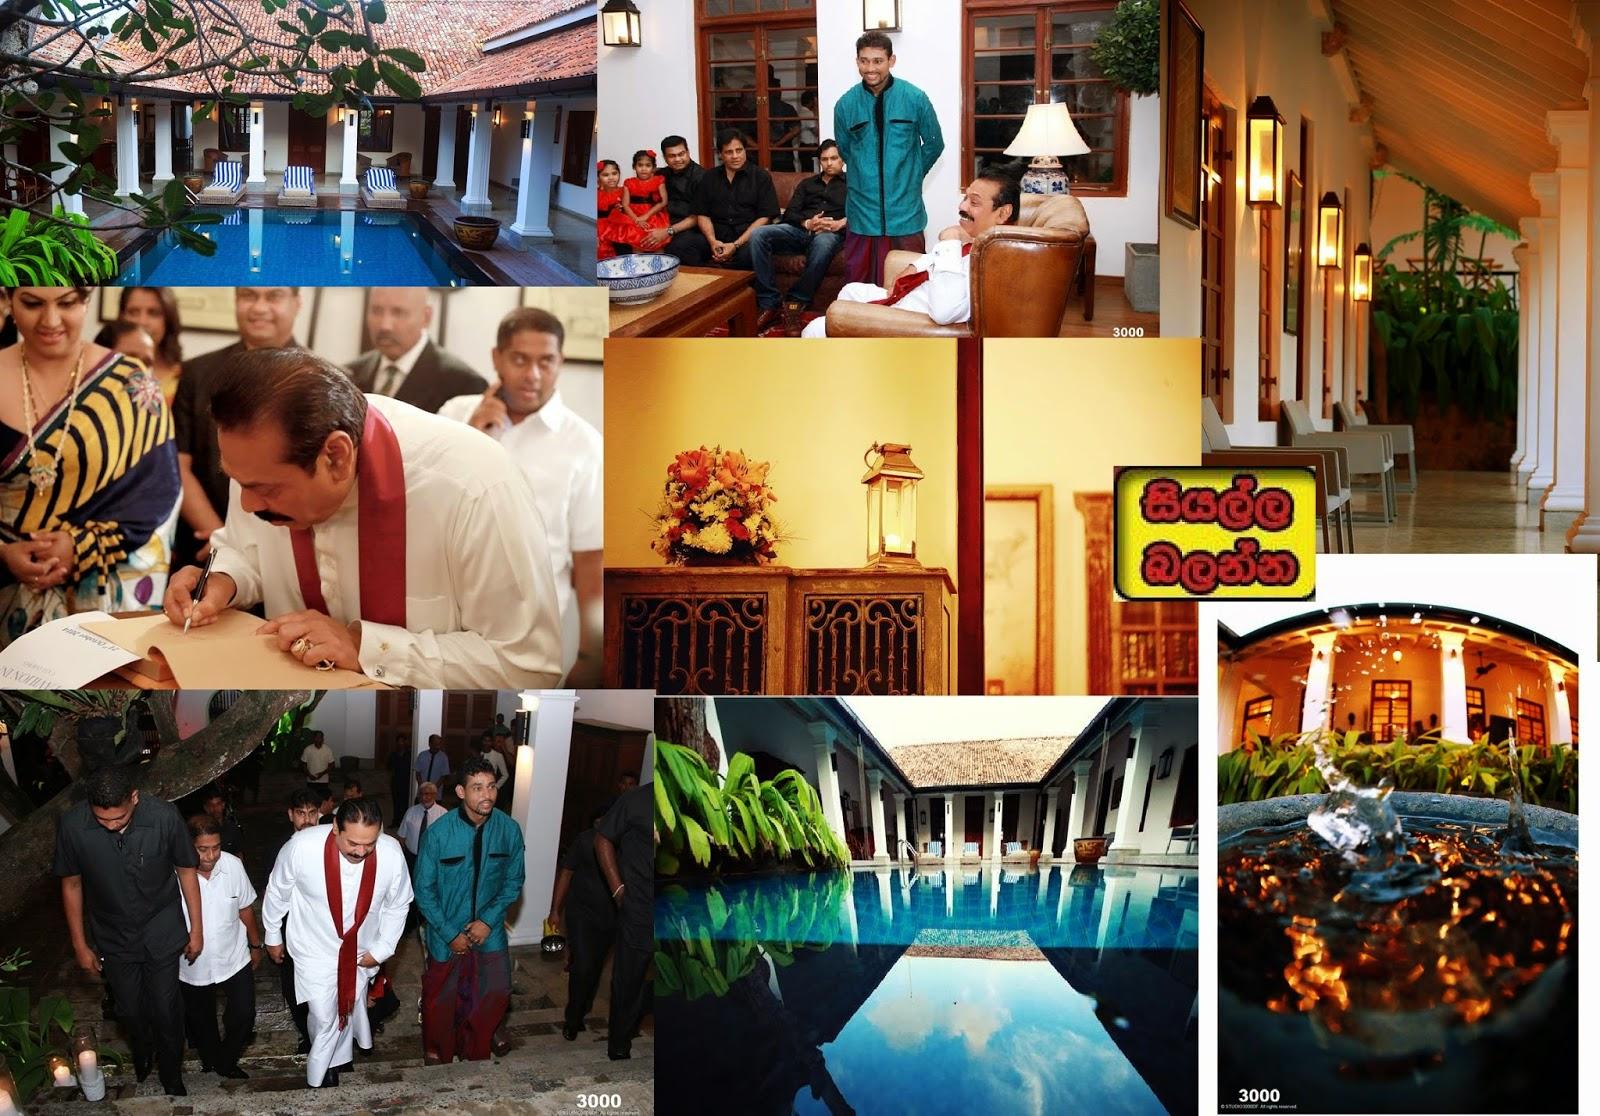 http://picture.gossiplankahotnews.com/2014/10/dilshans-d-pavilion-inn-hotel.html